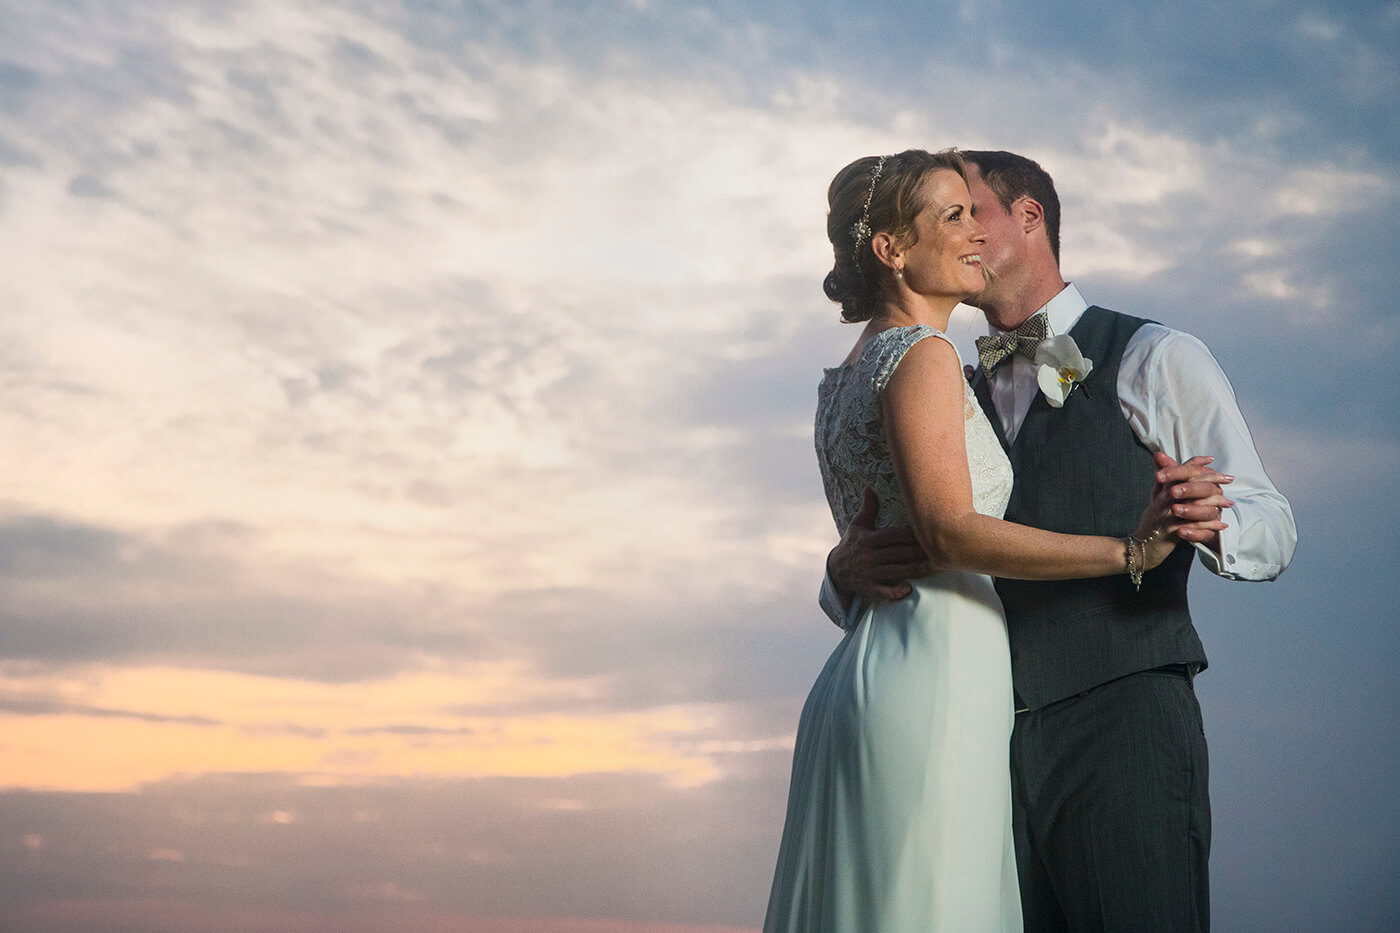 Wedding_Couples_Photographer_Austin_Texas_Dennis_Burnett_08